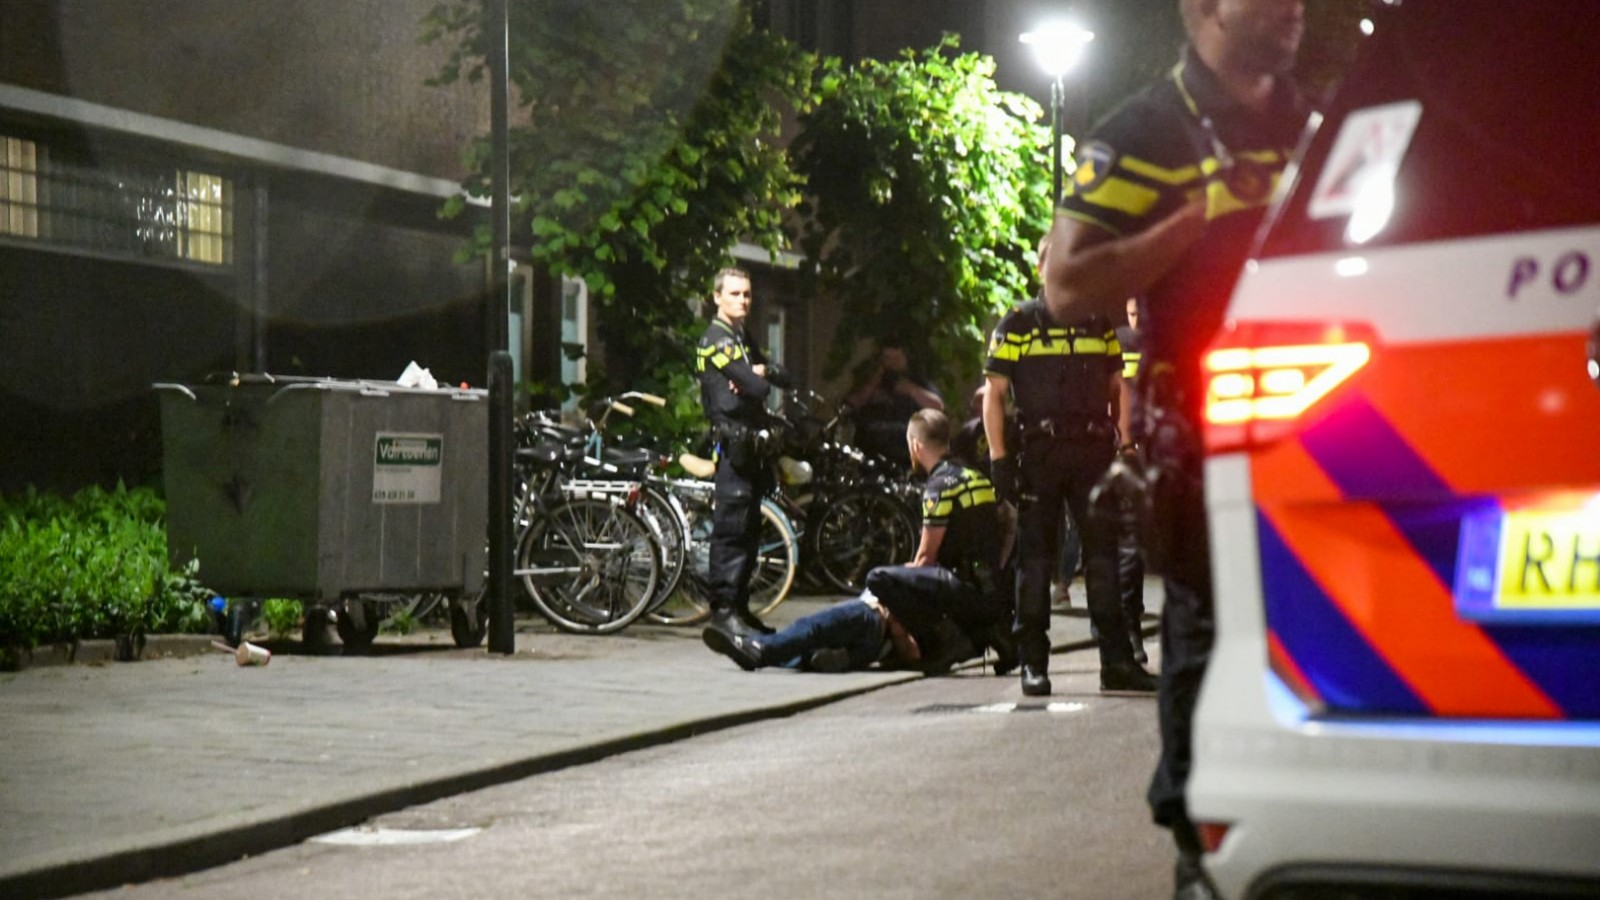 Persoon aangehouden na steekpartij in centrum Hilversum, hulpverleners bekogeld